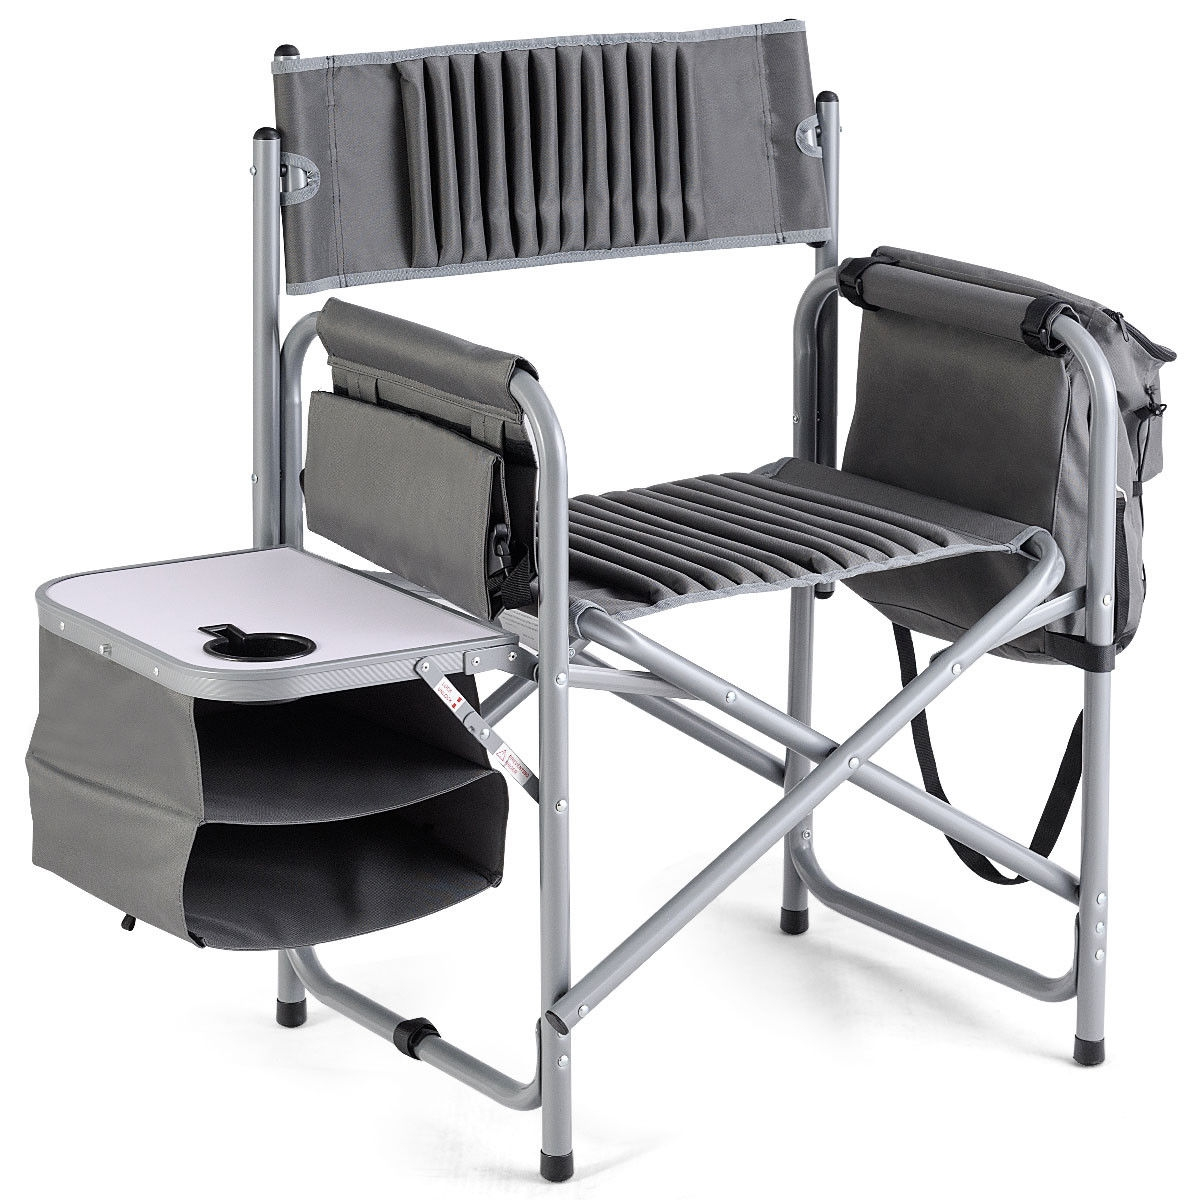 Folding Chairs Stools